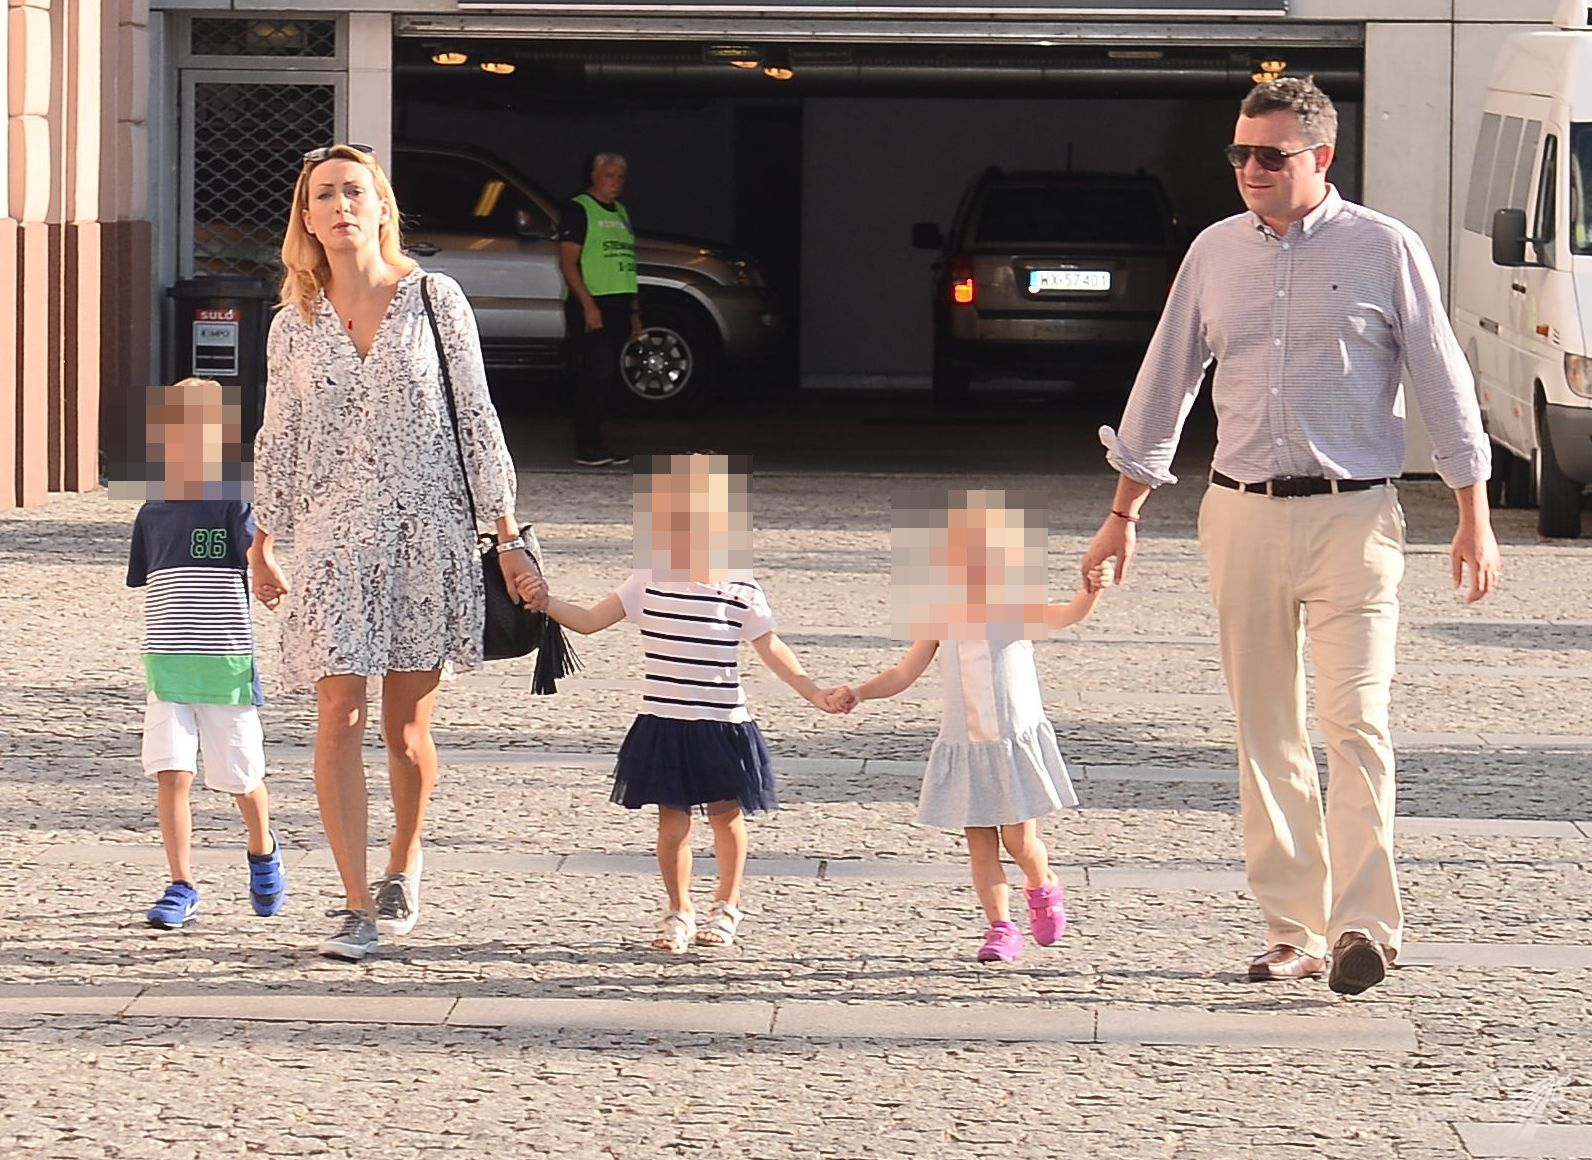 Anna Kalczyńska z mężem i dziećmi na Wielkim Meczu TVN vs TVP Fot. ons